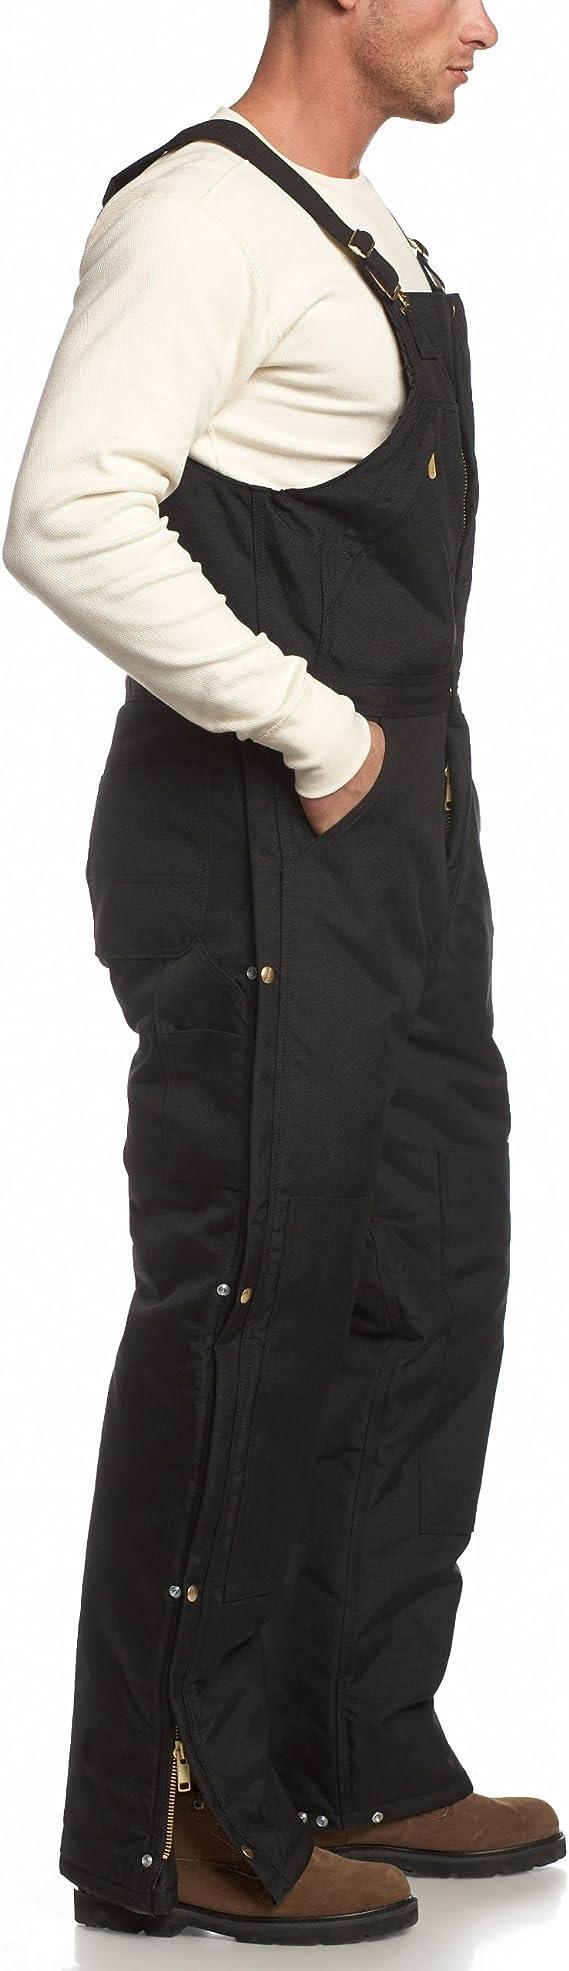 Carhartt Mens Yukon Arctic Quilt Lined Zip to Waist Biberalls R33